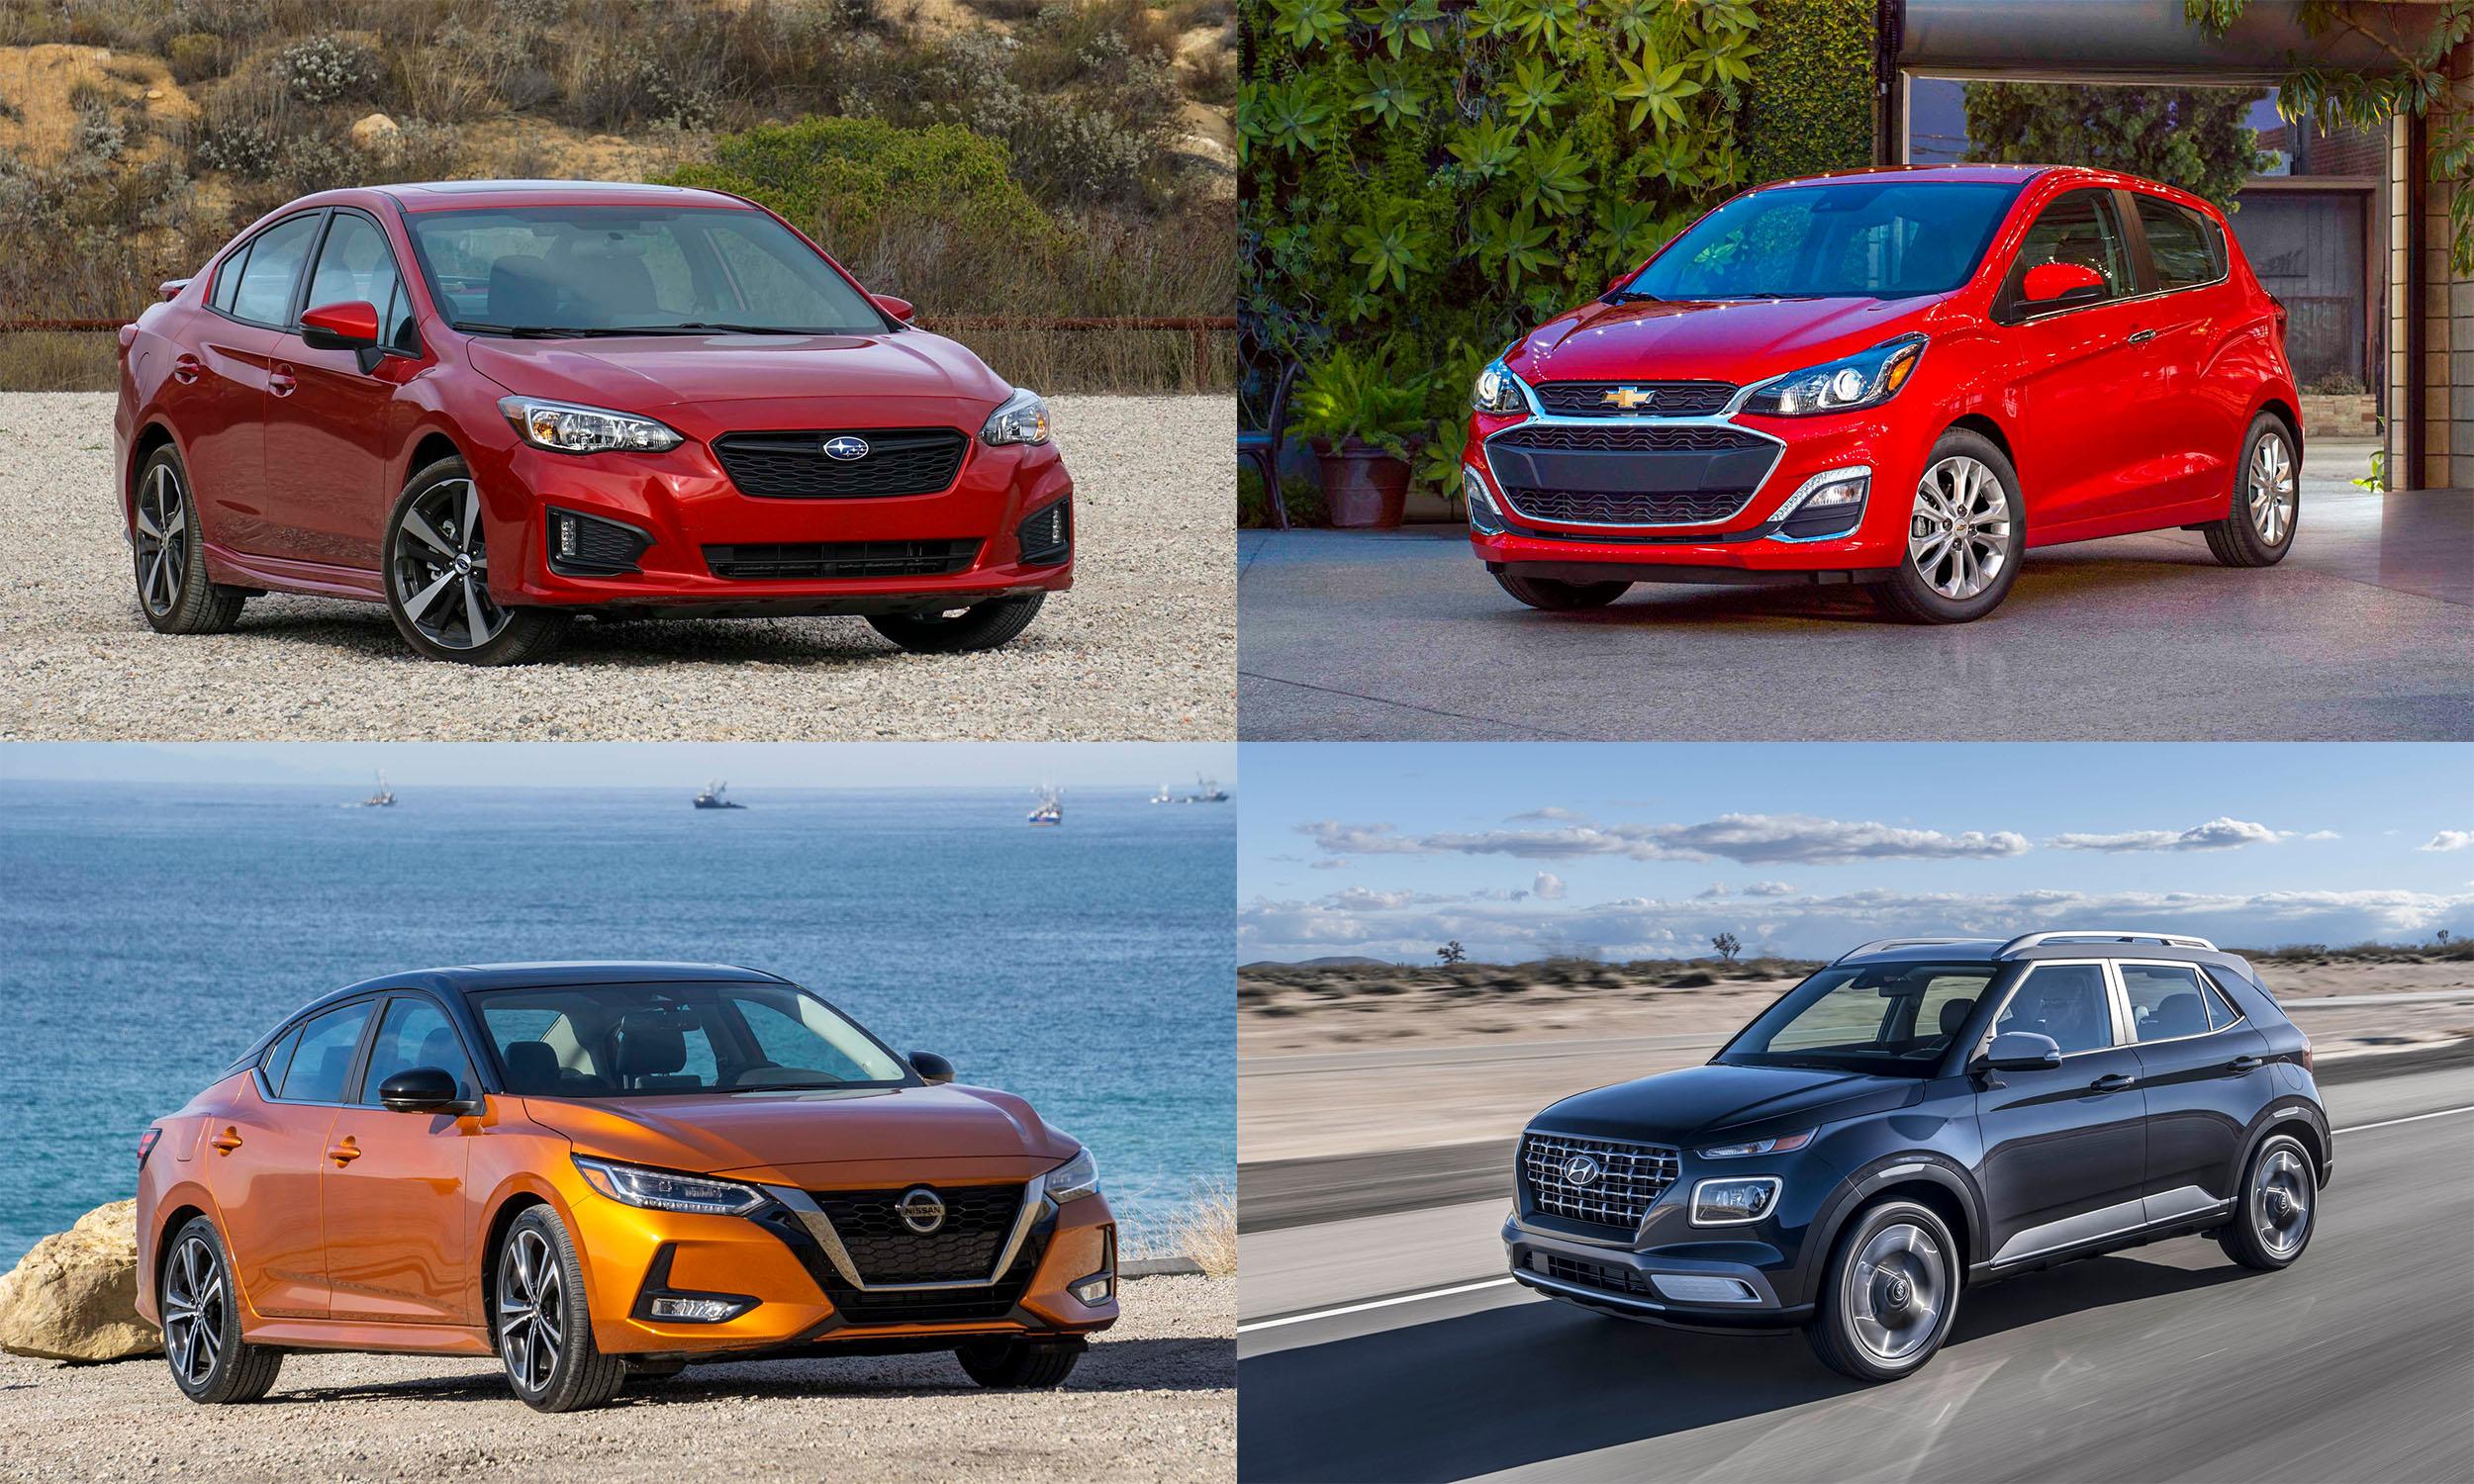 © Automotive Content Experience, © General Motors, © Hyundai Motor America